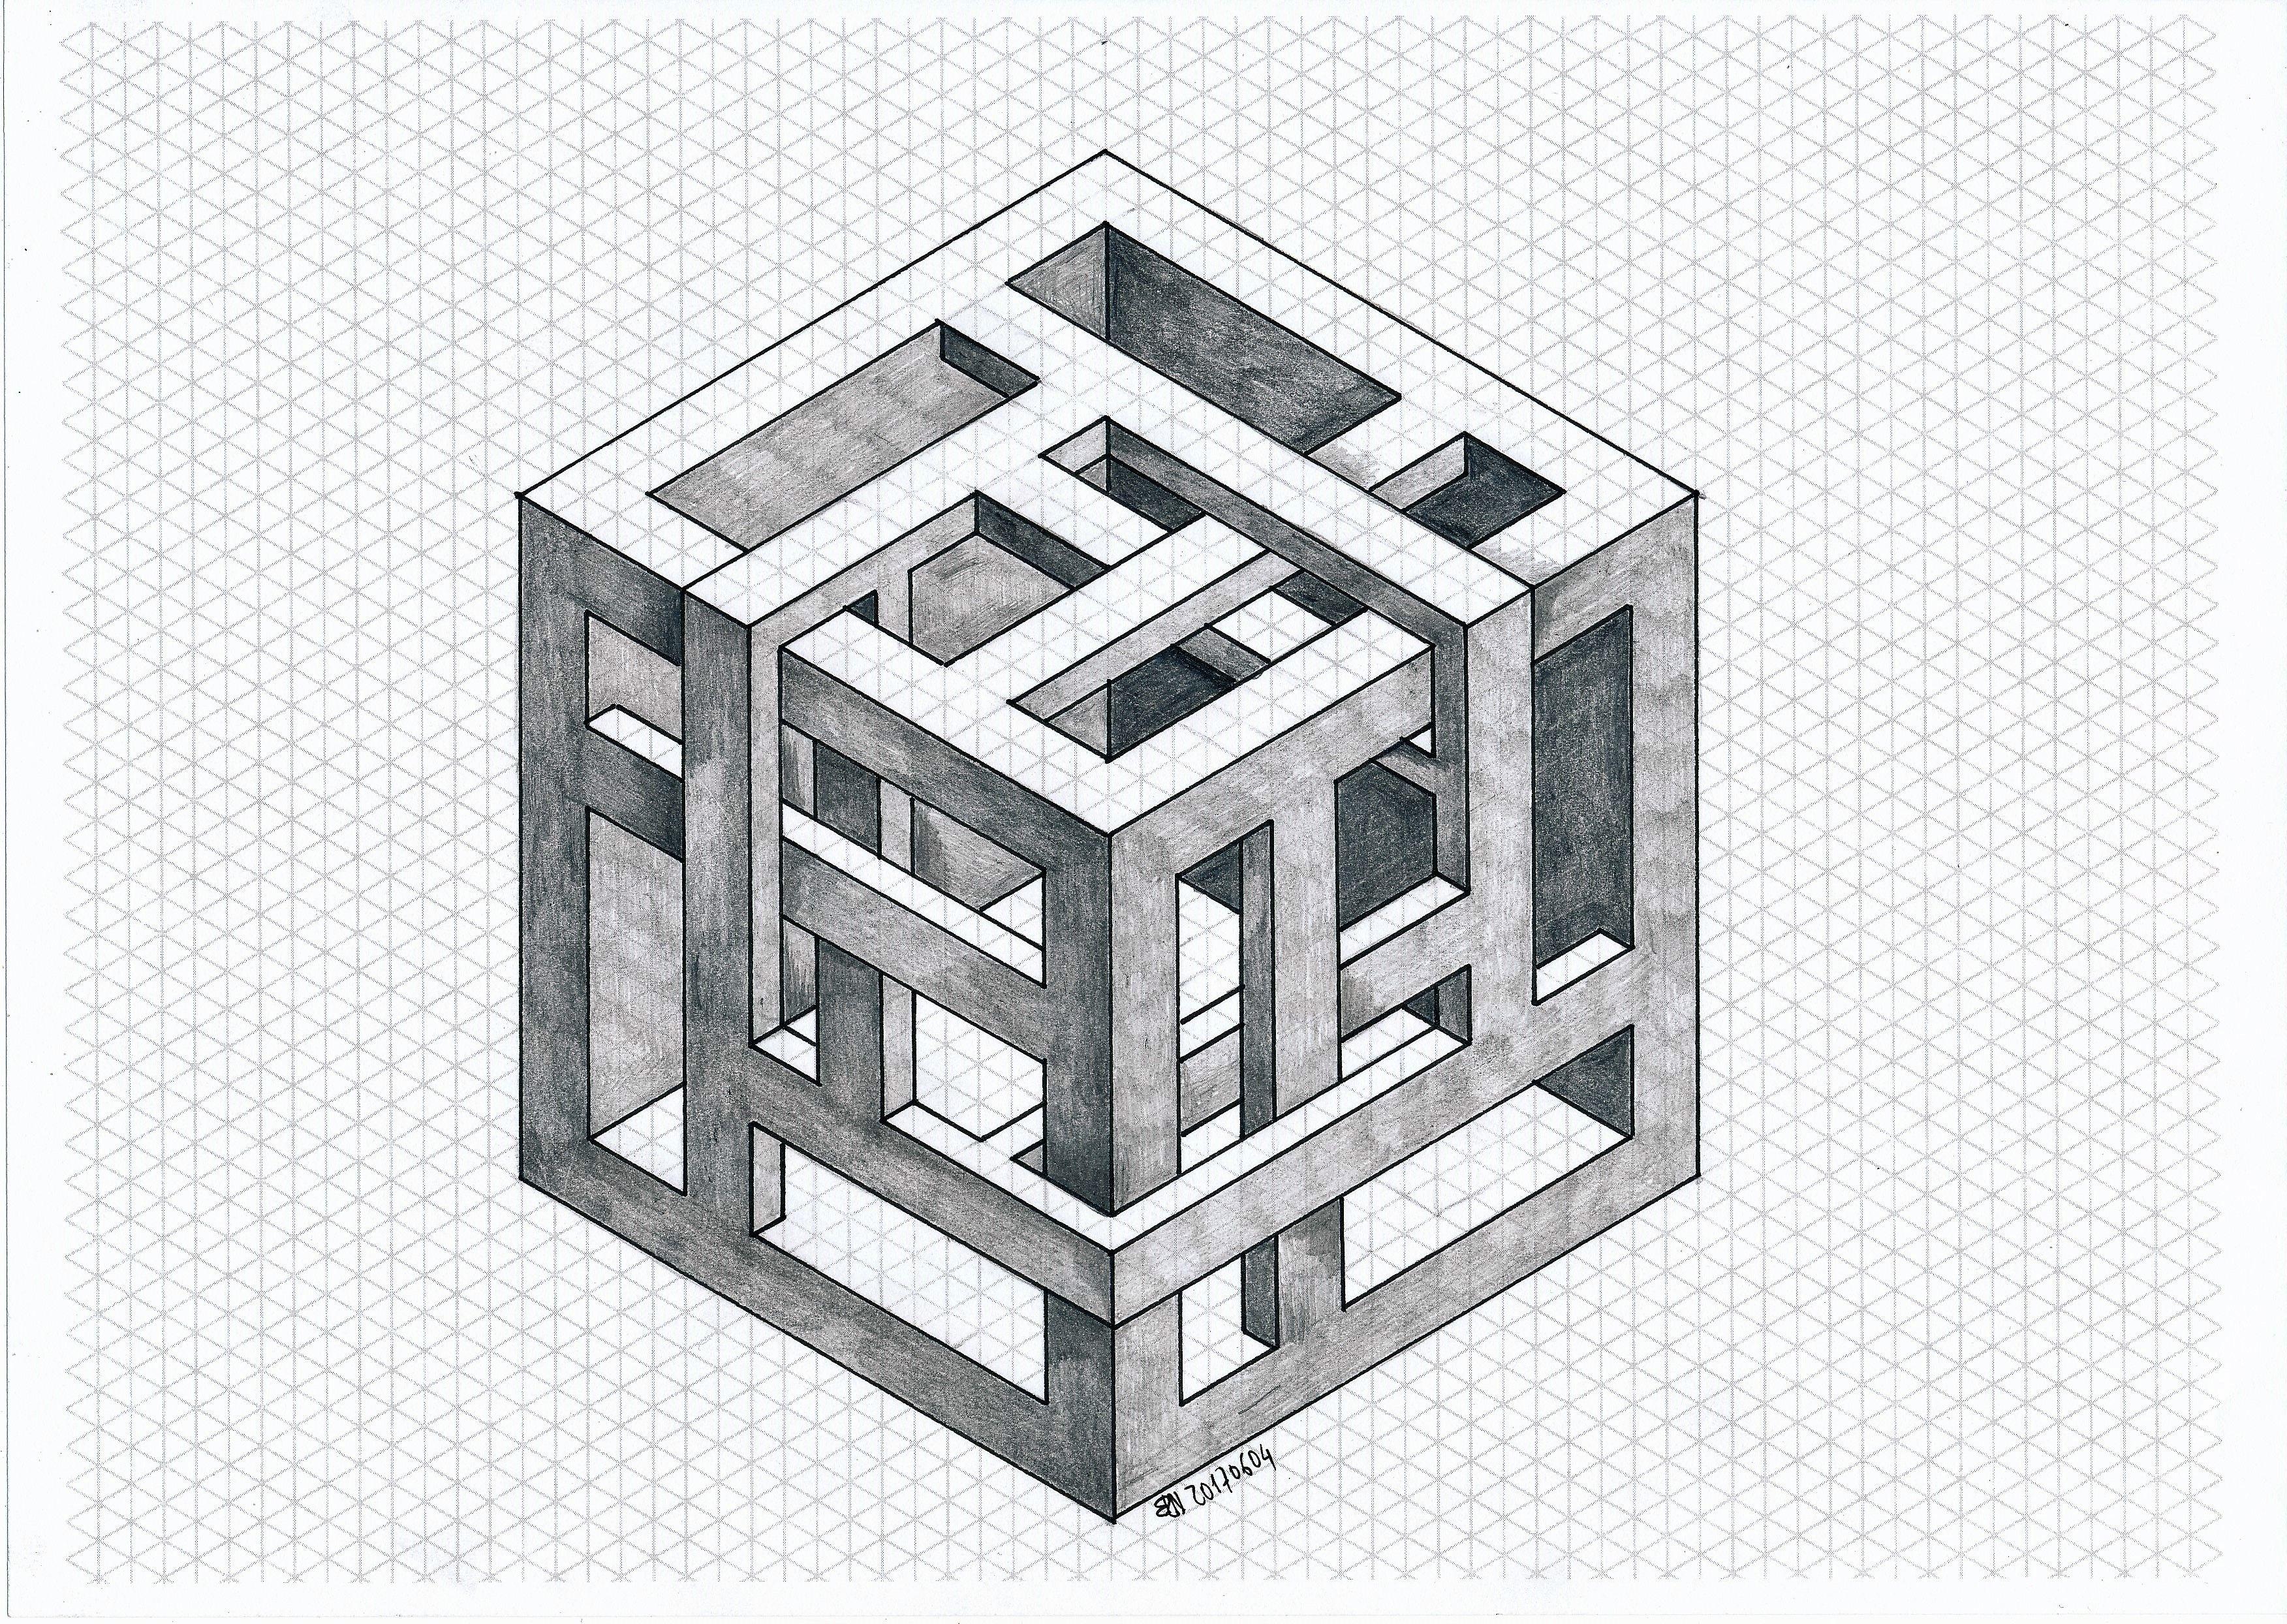 #impossible #isometric #geometry #symmetry #penrose #